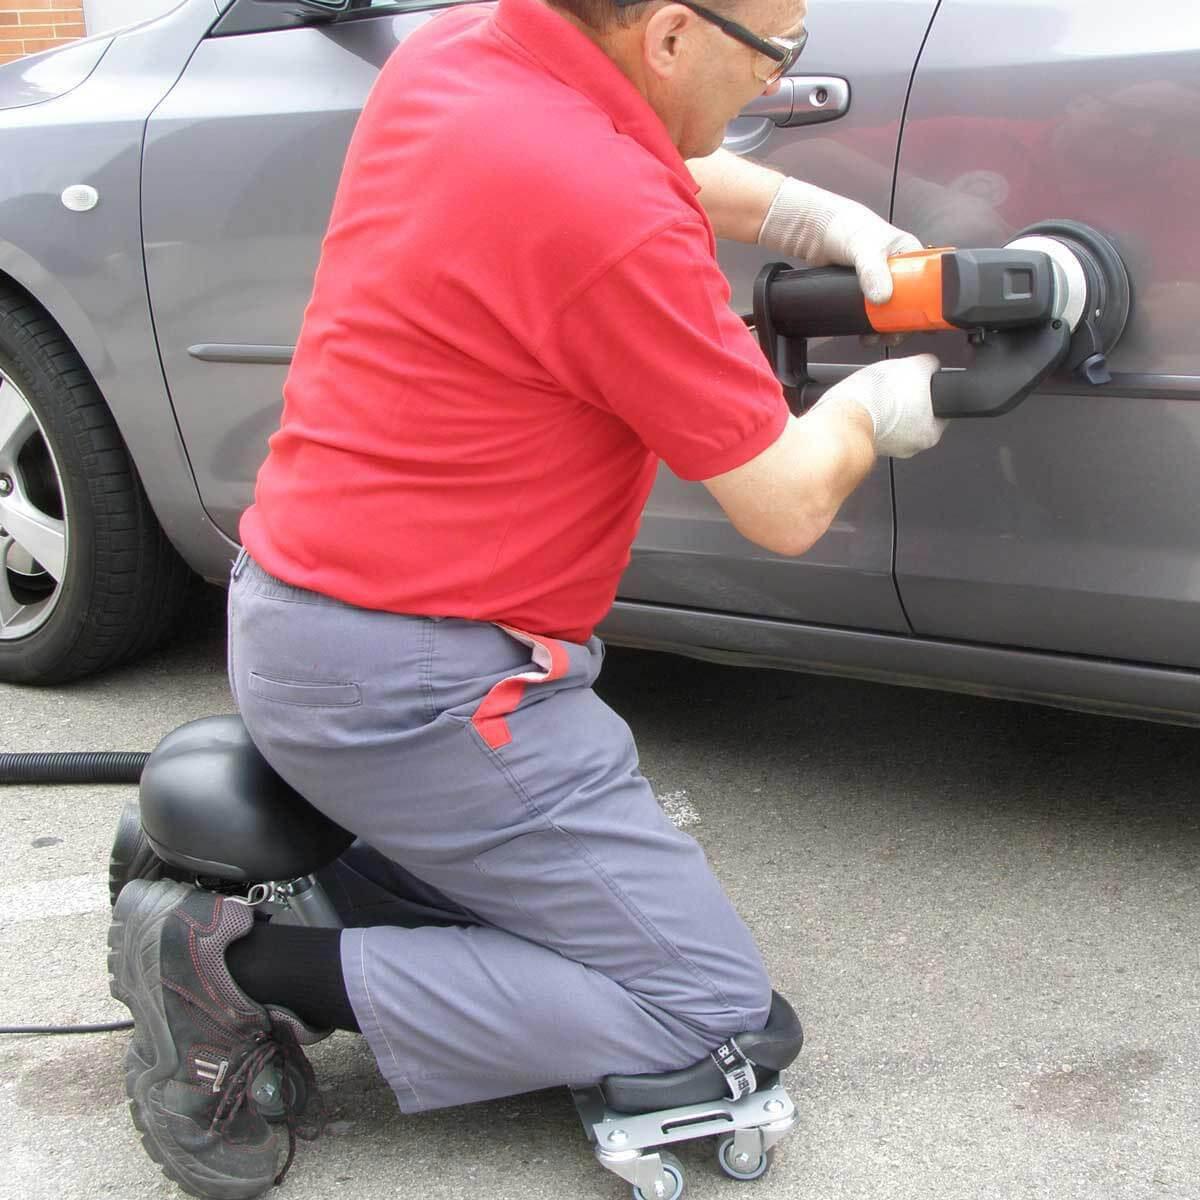 Rubi SR1 Ergonomic Knee Pad polish